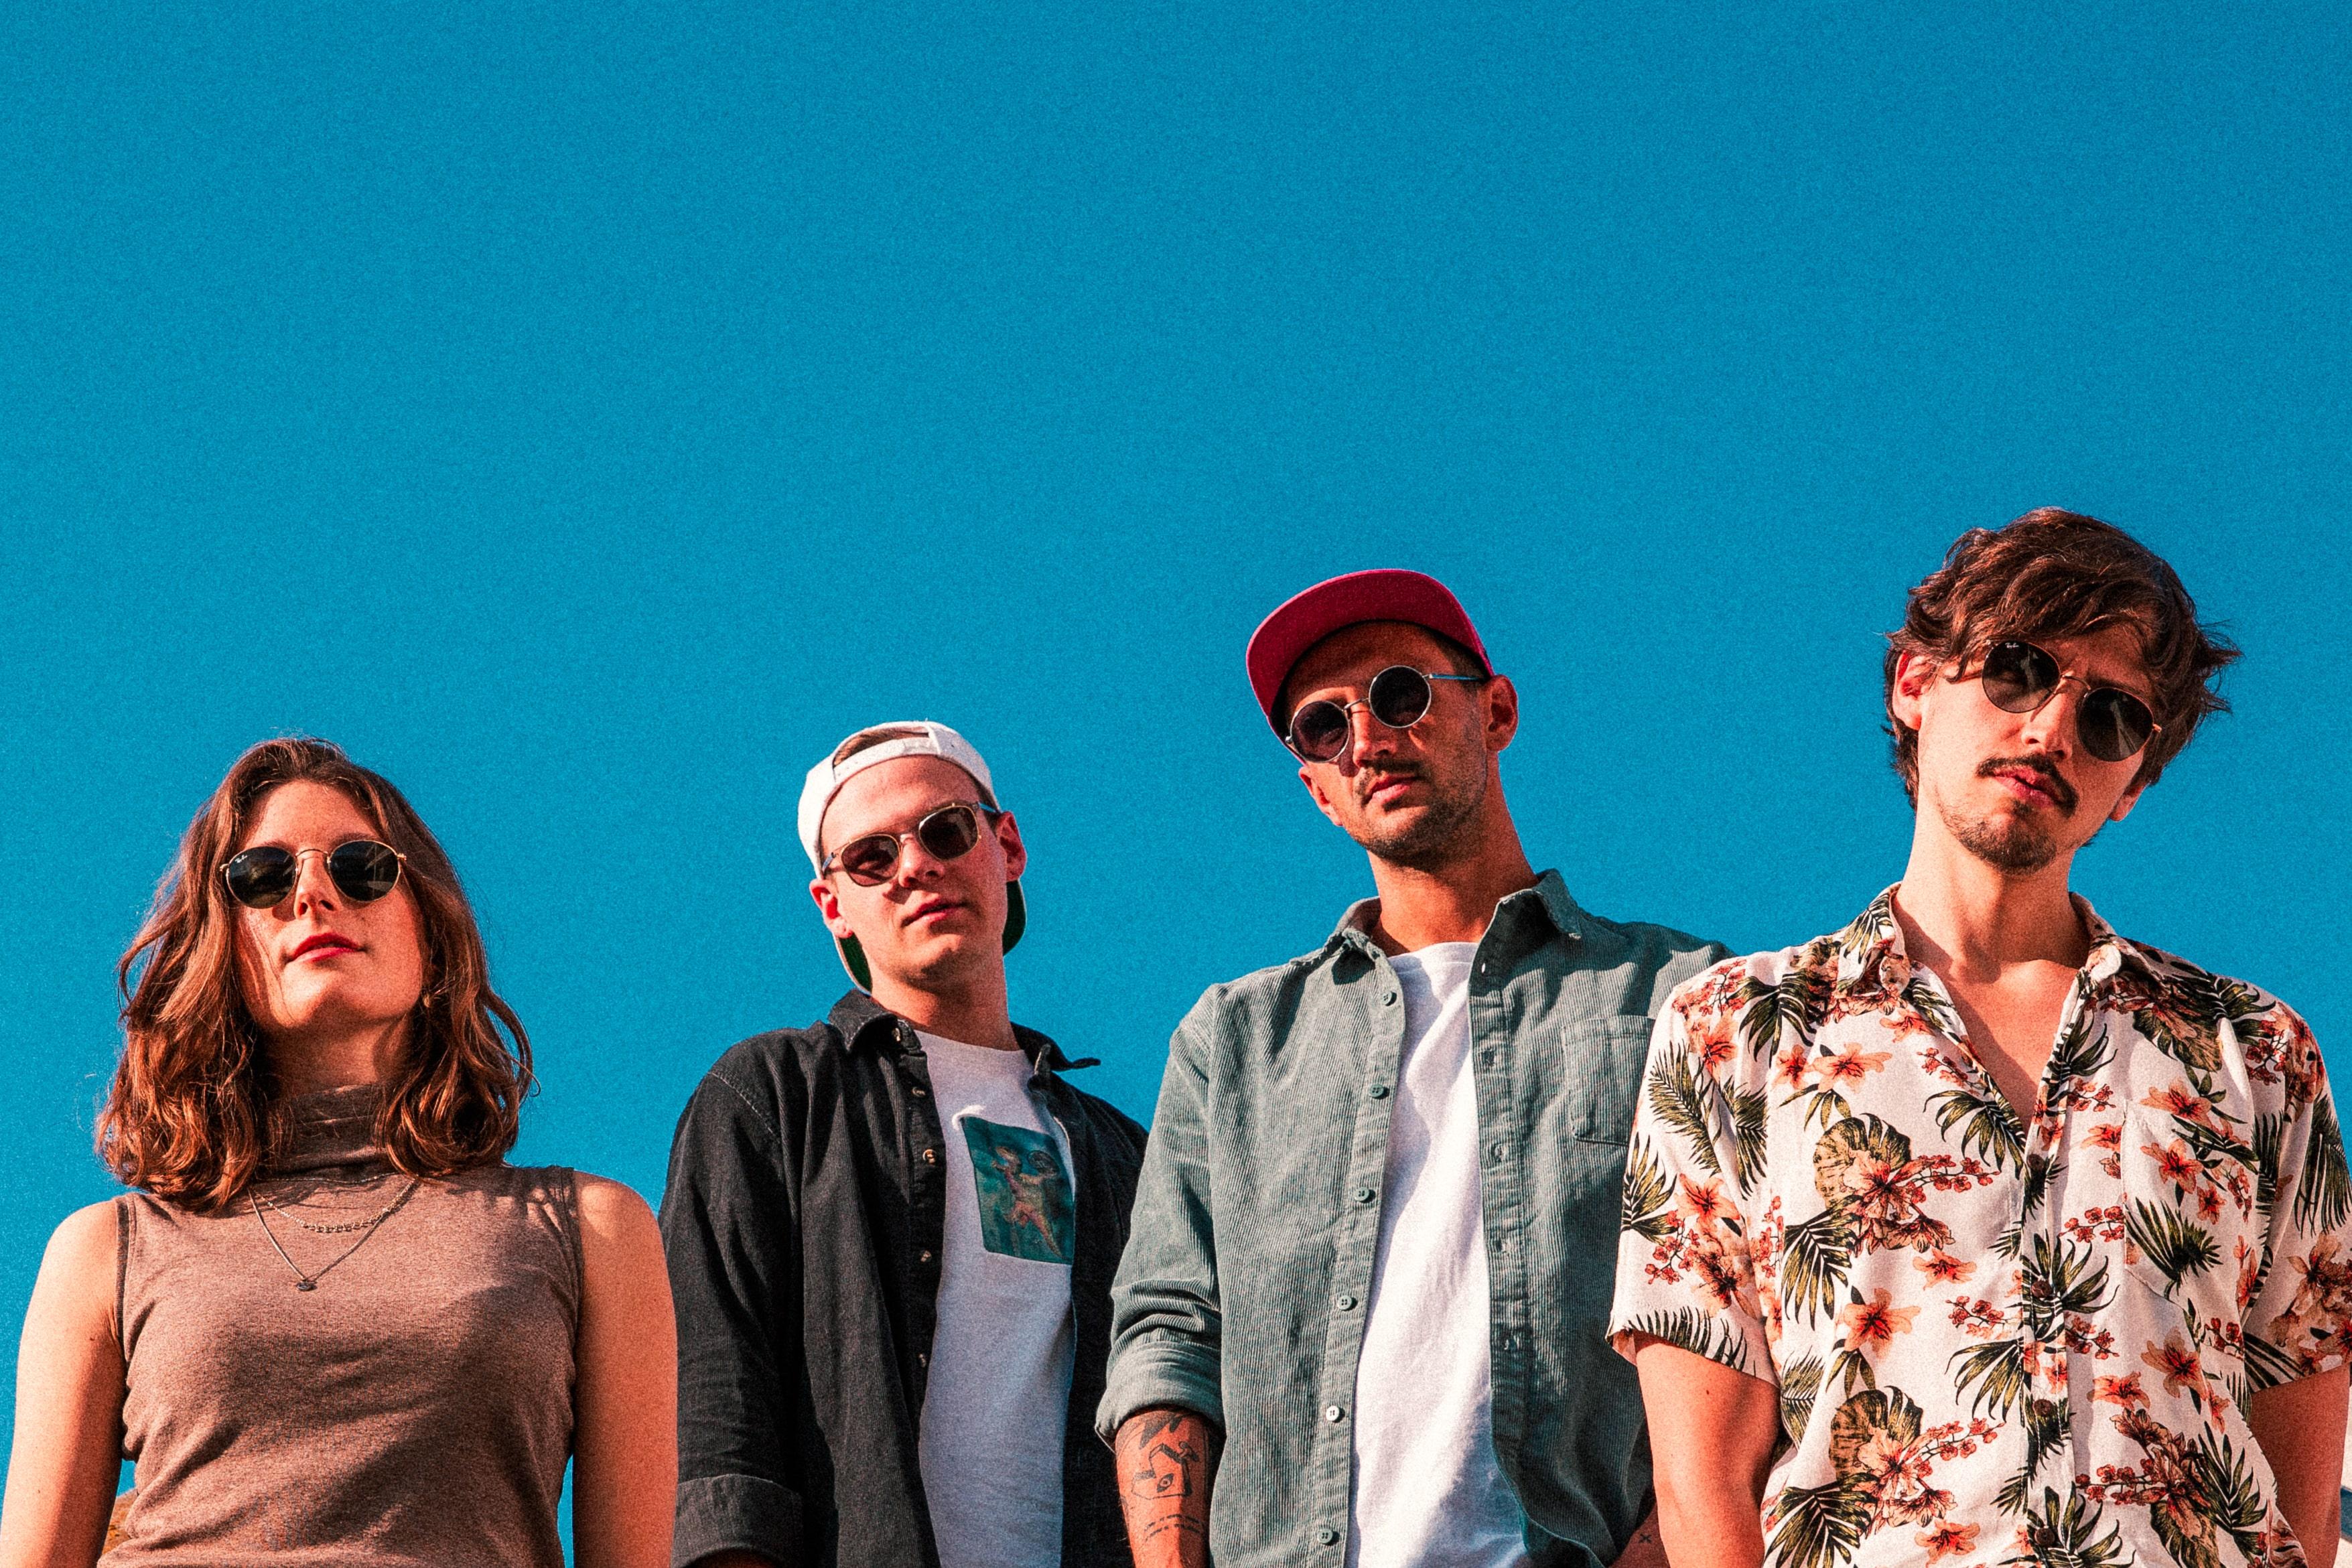 Moon Mates, Indie, IndieBand, Picky, Pickymagazine, Musik, Musikblog